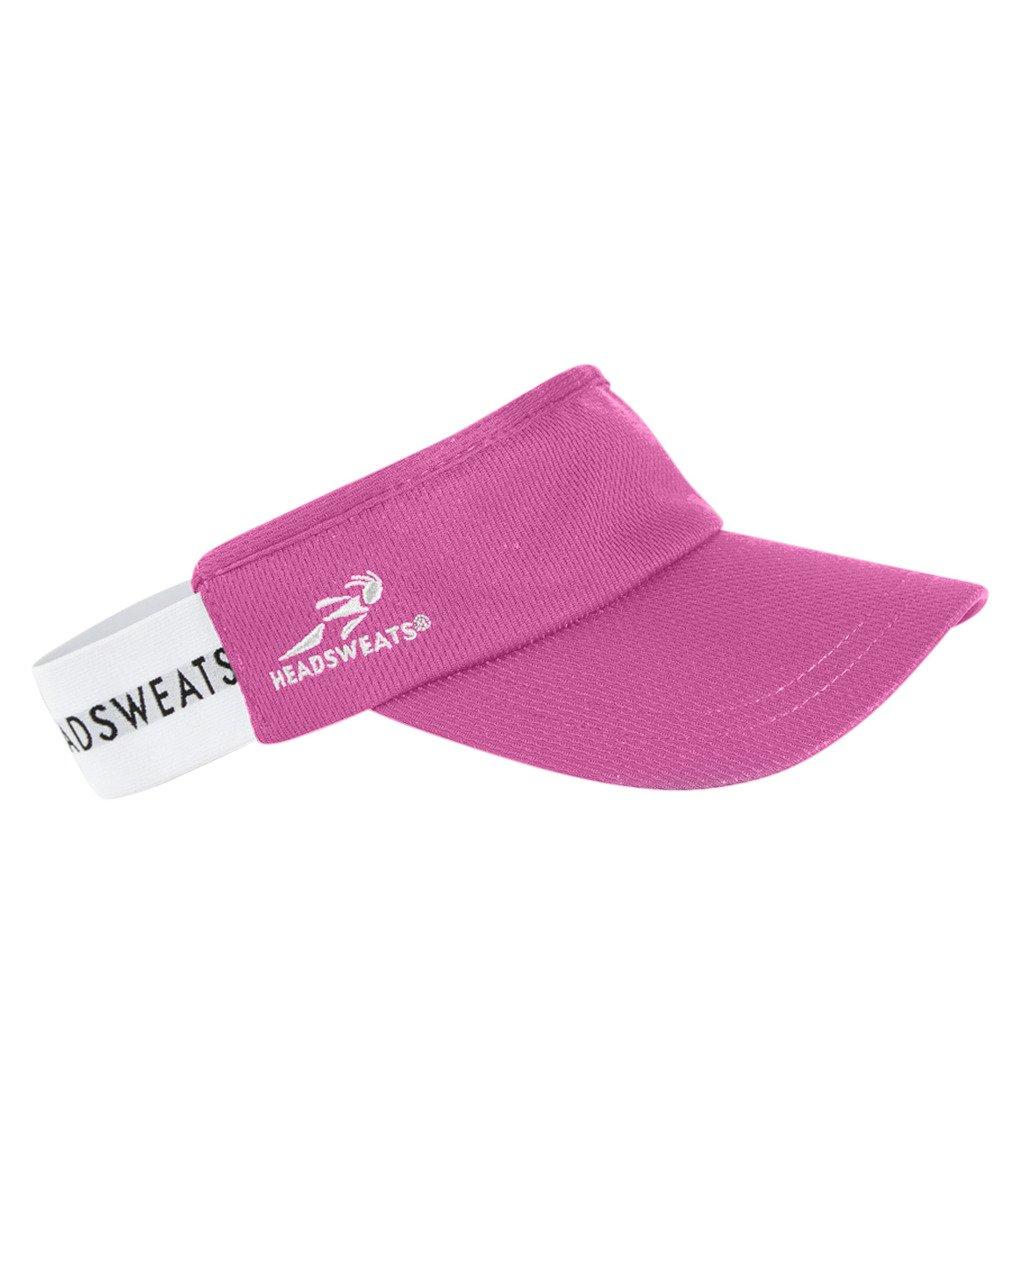 Headsweats Supervisor Sun Visor - Pink Fusion by Headsweats